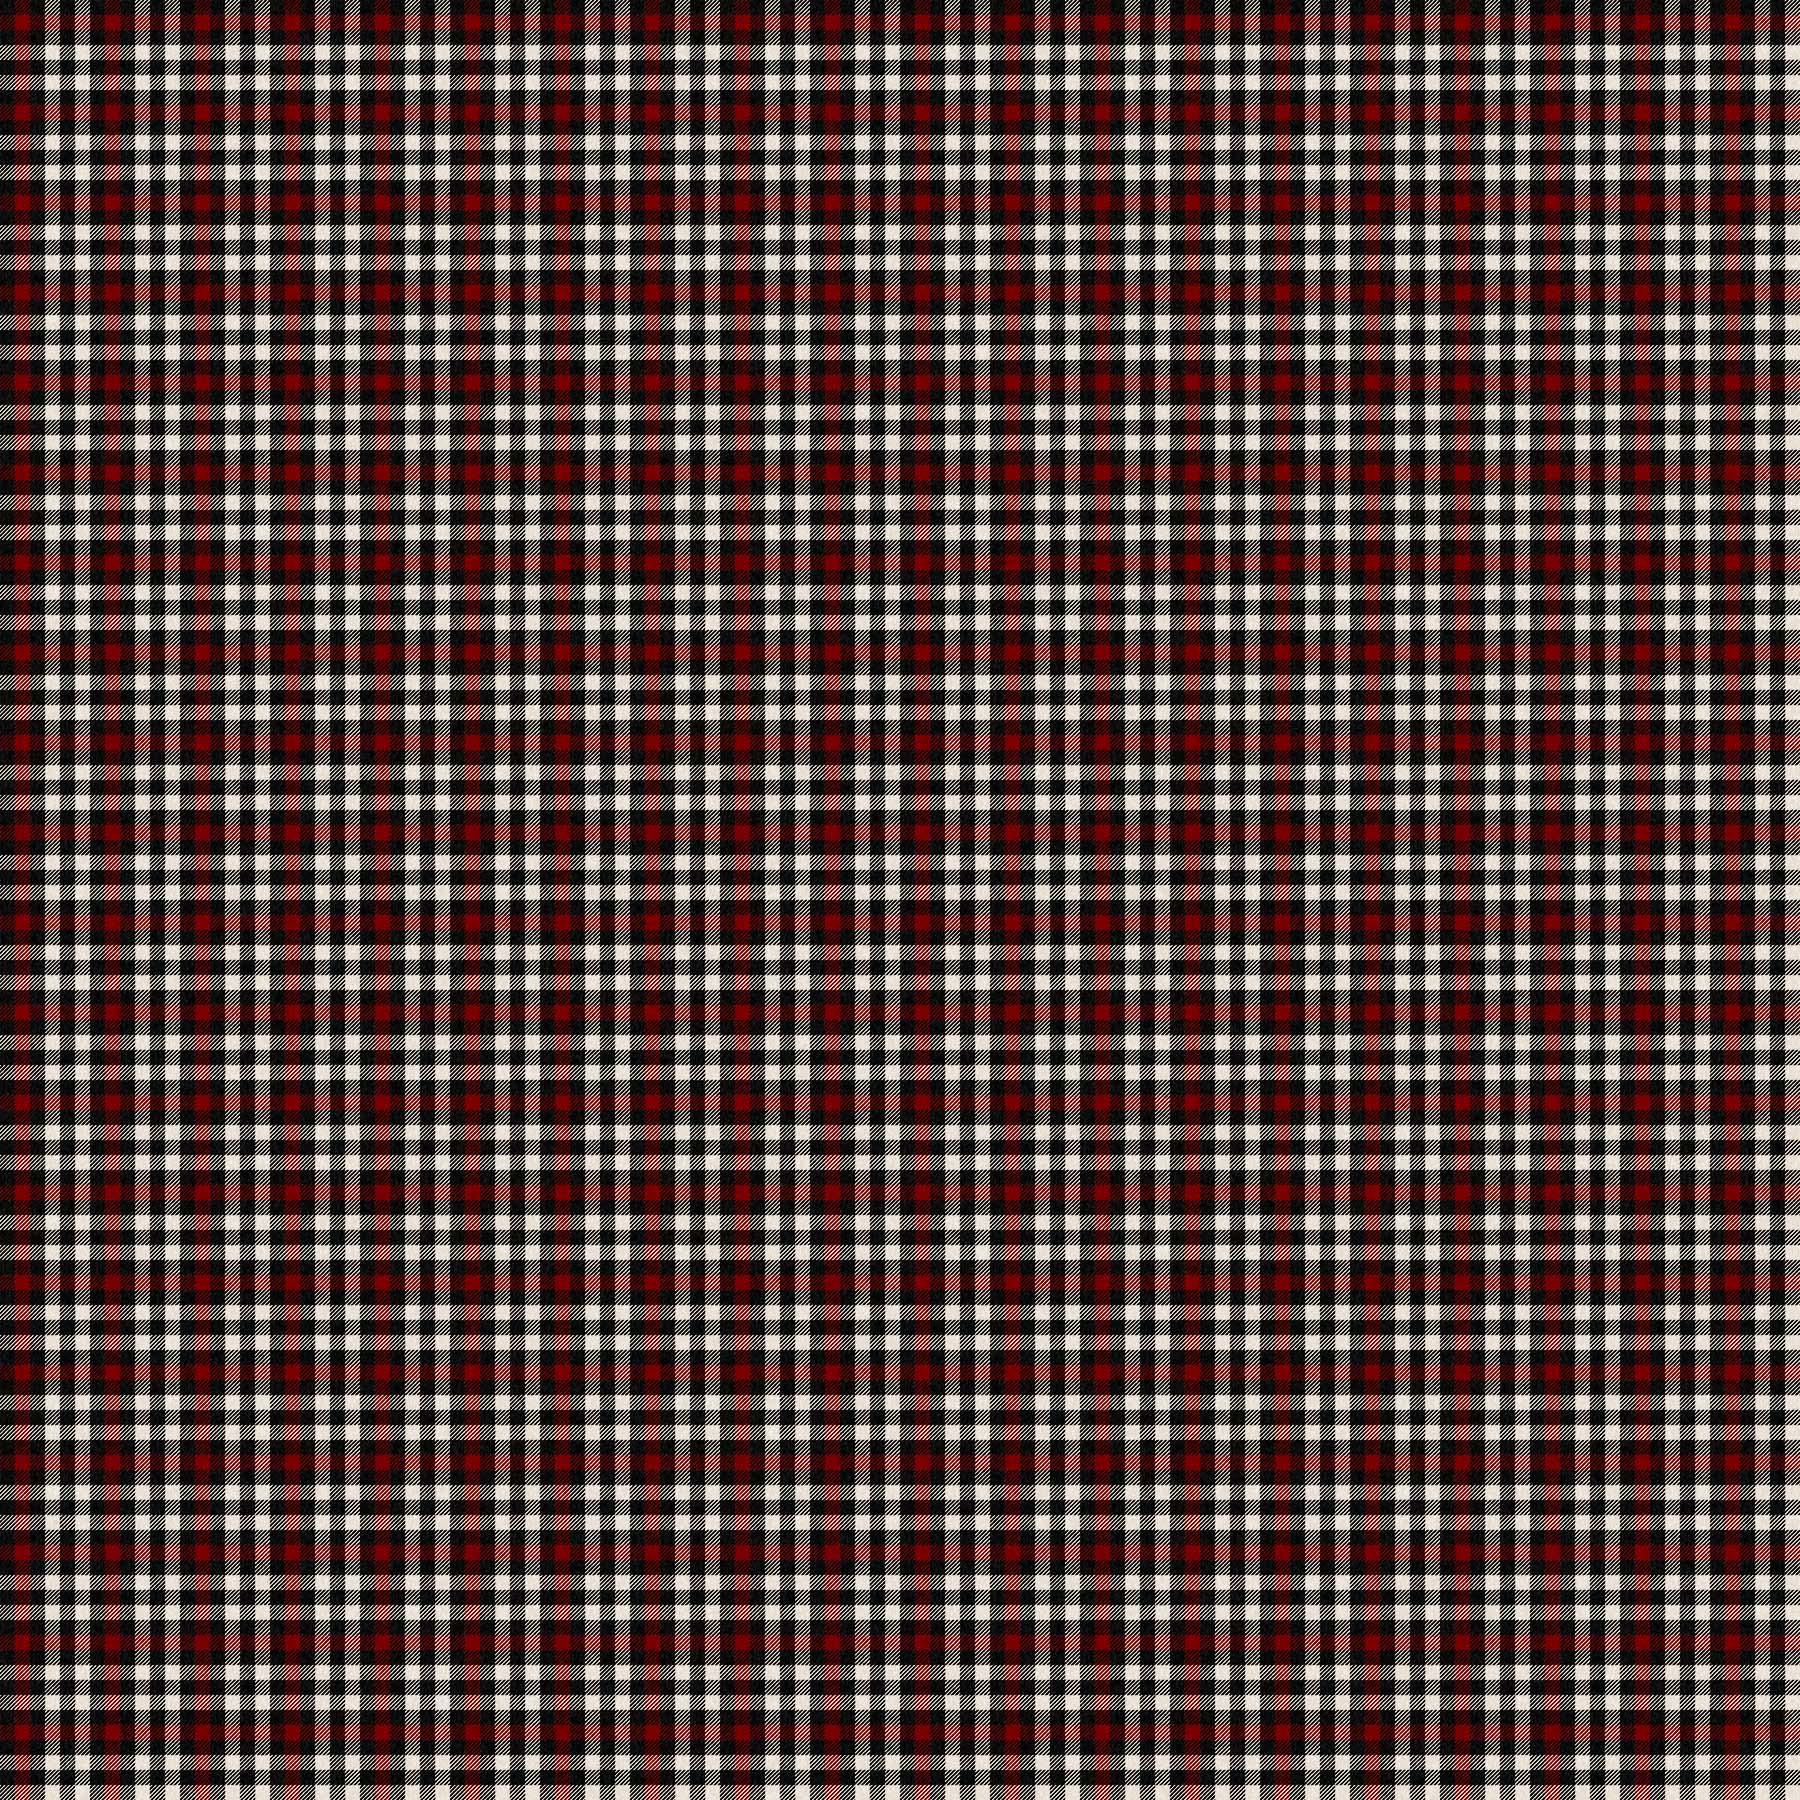 WEST CREEK RED BLACK Milbrook W23906-24